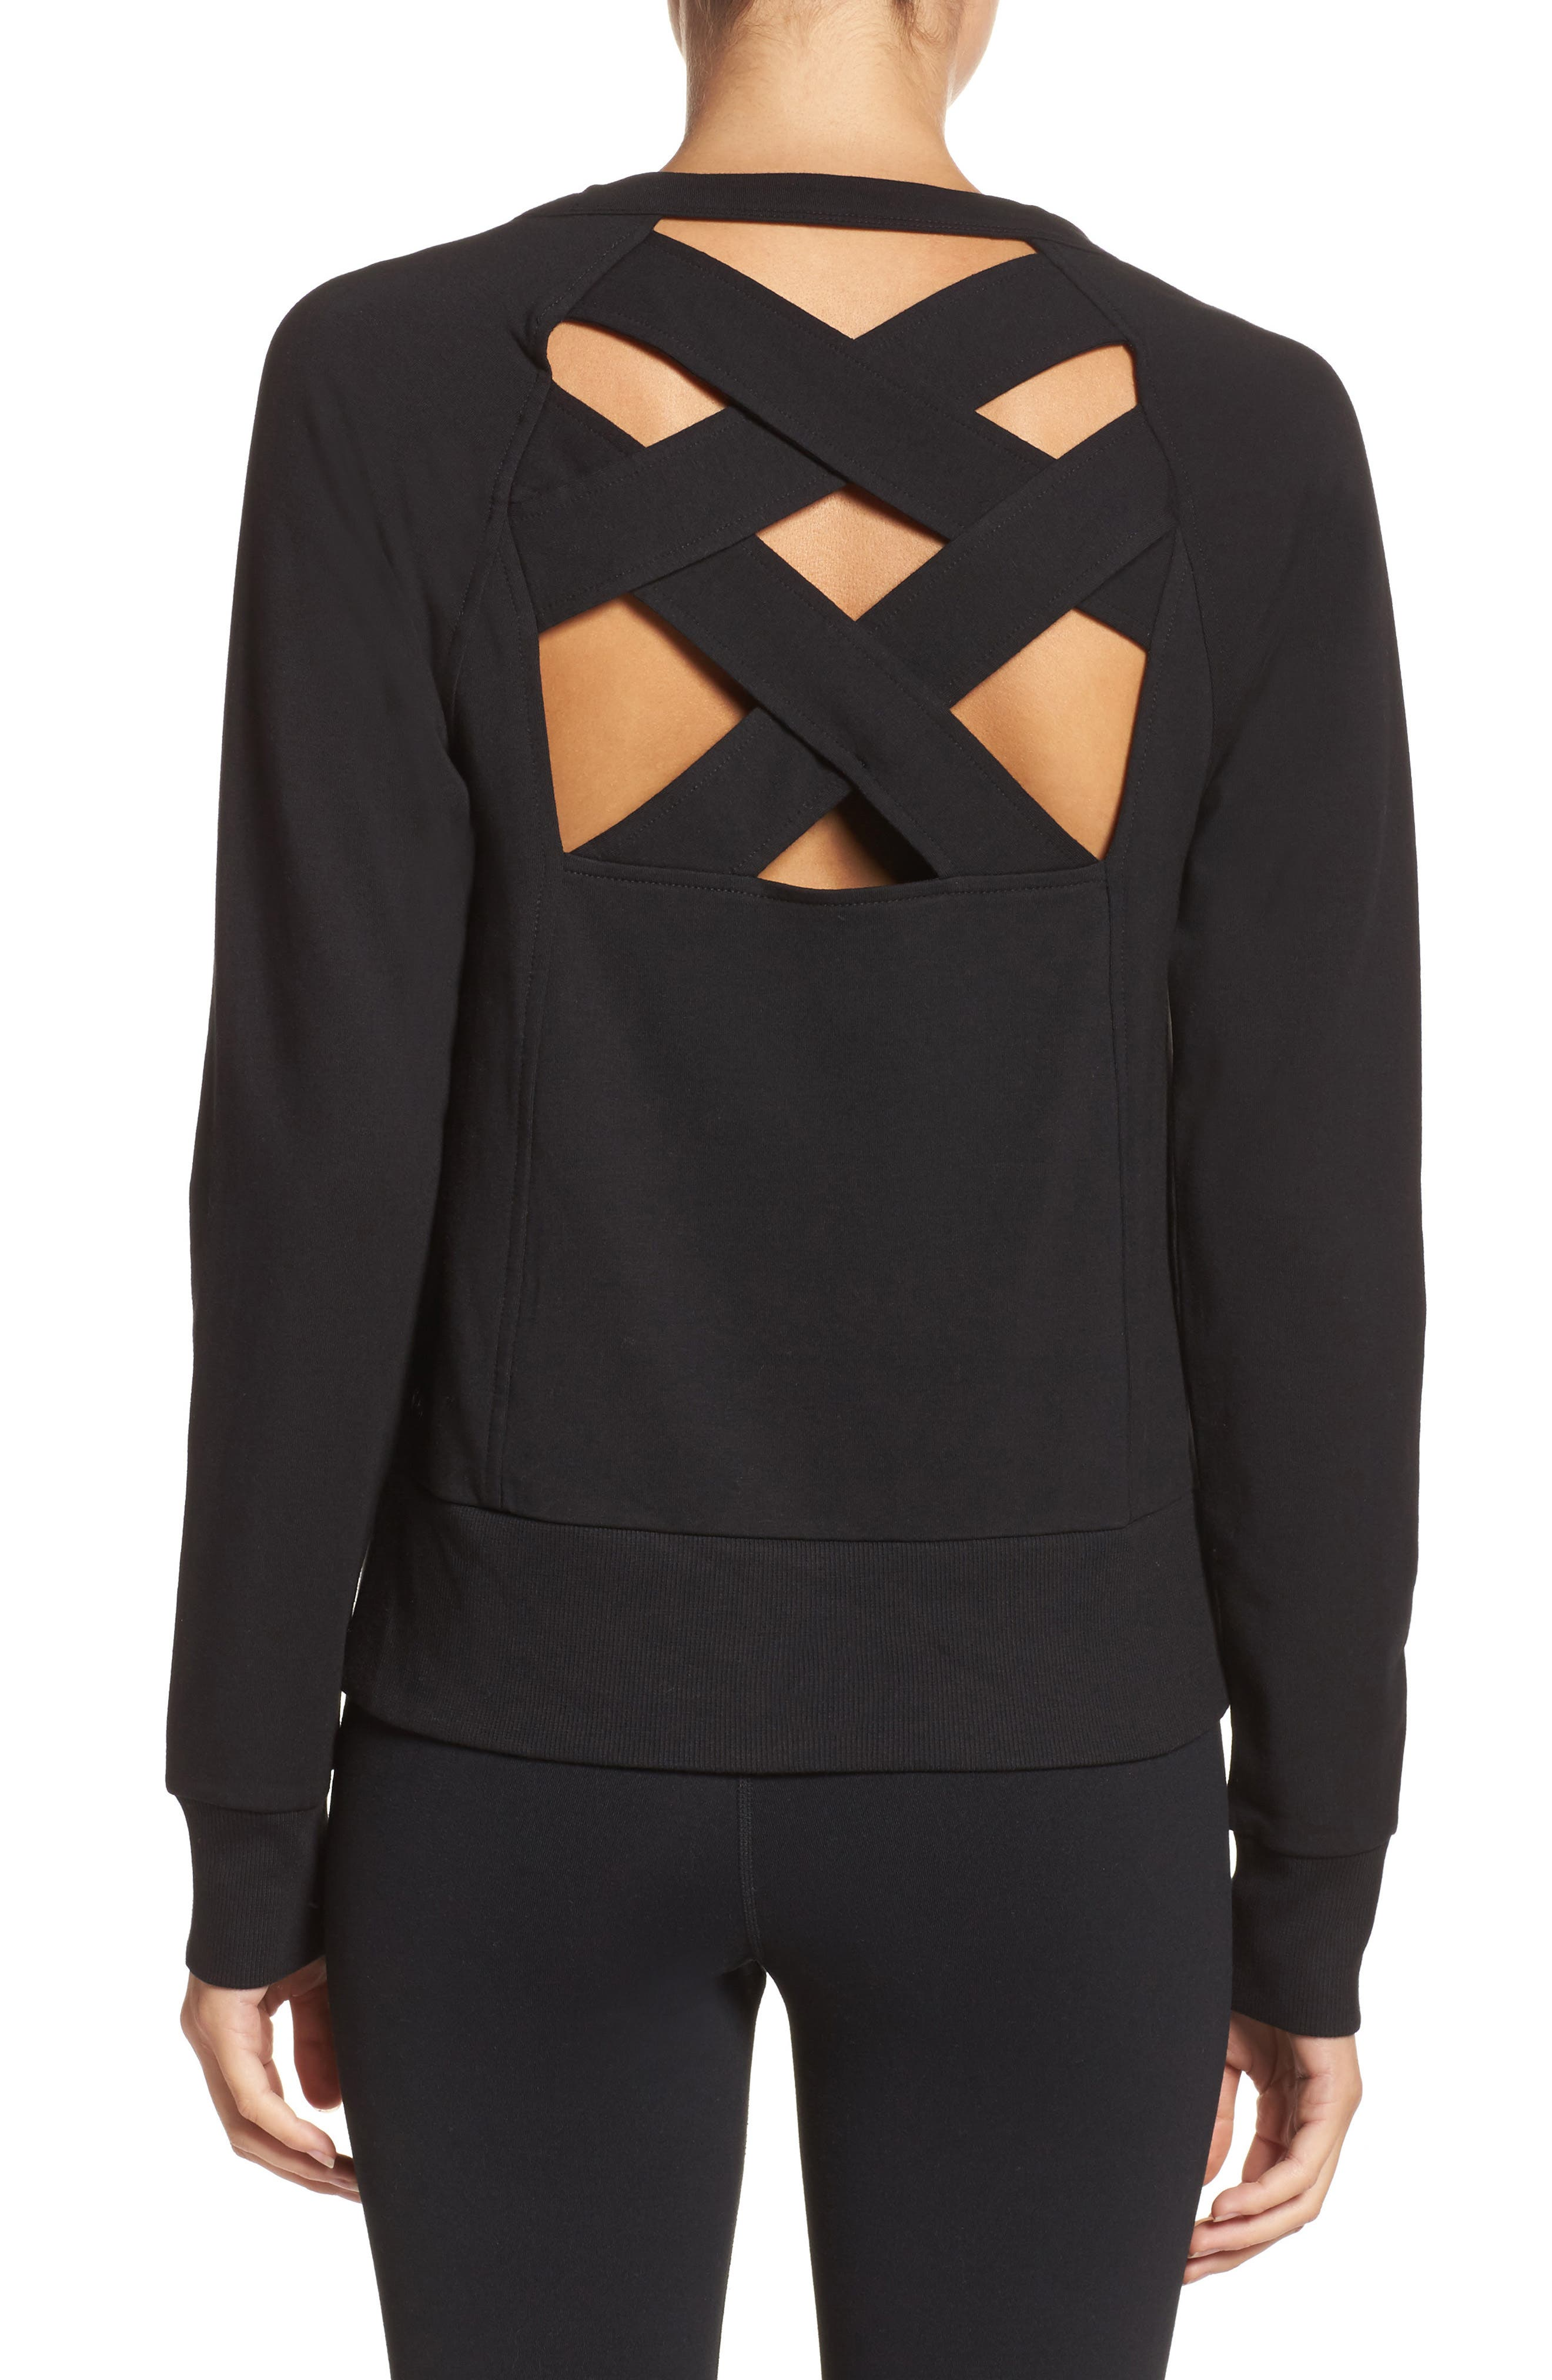 Zella Covet Crisscross Sweatshirt